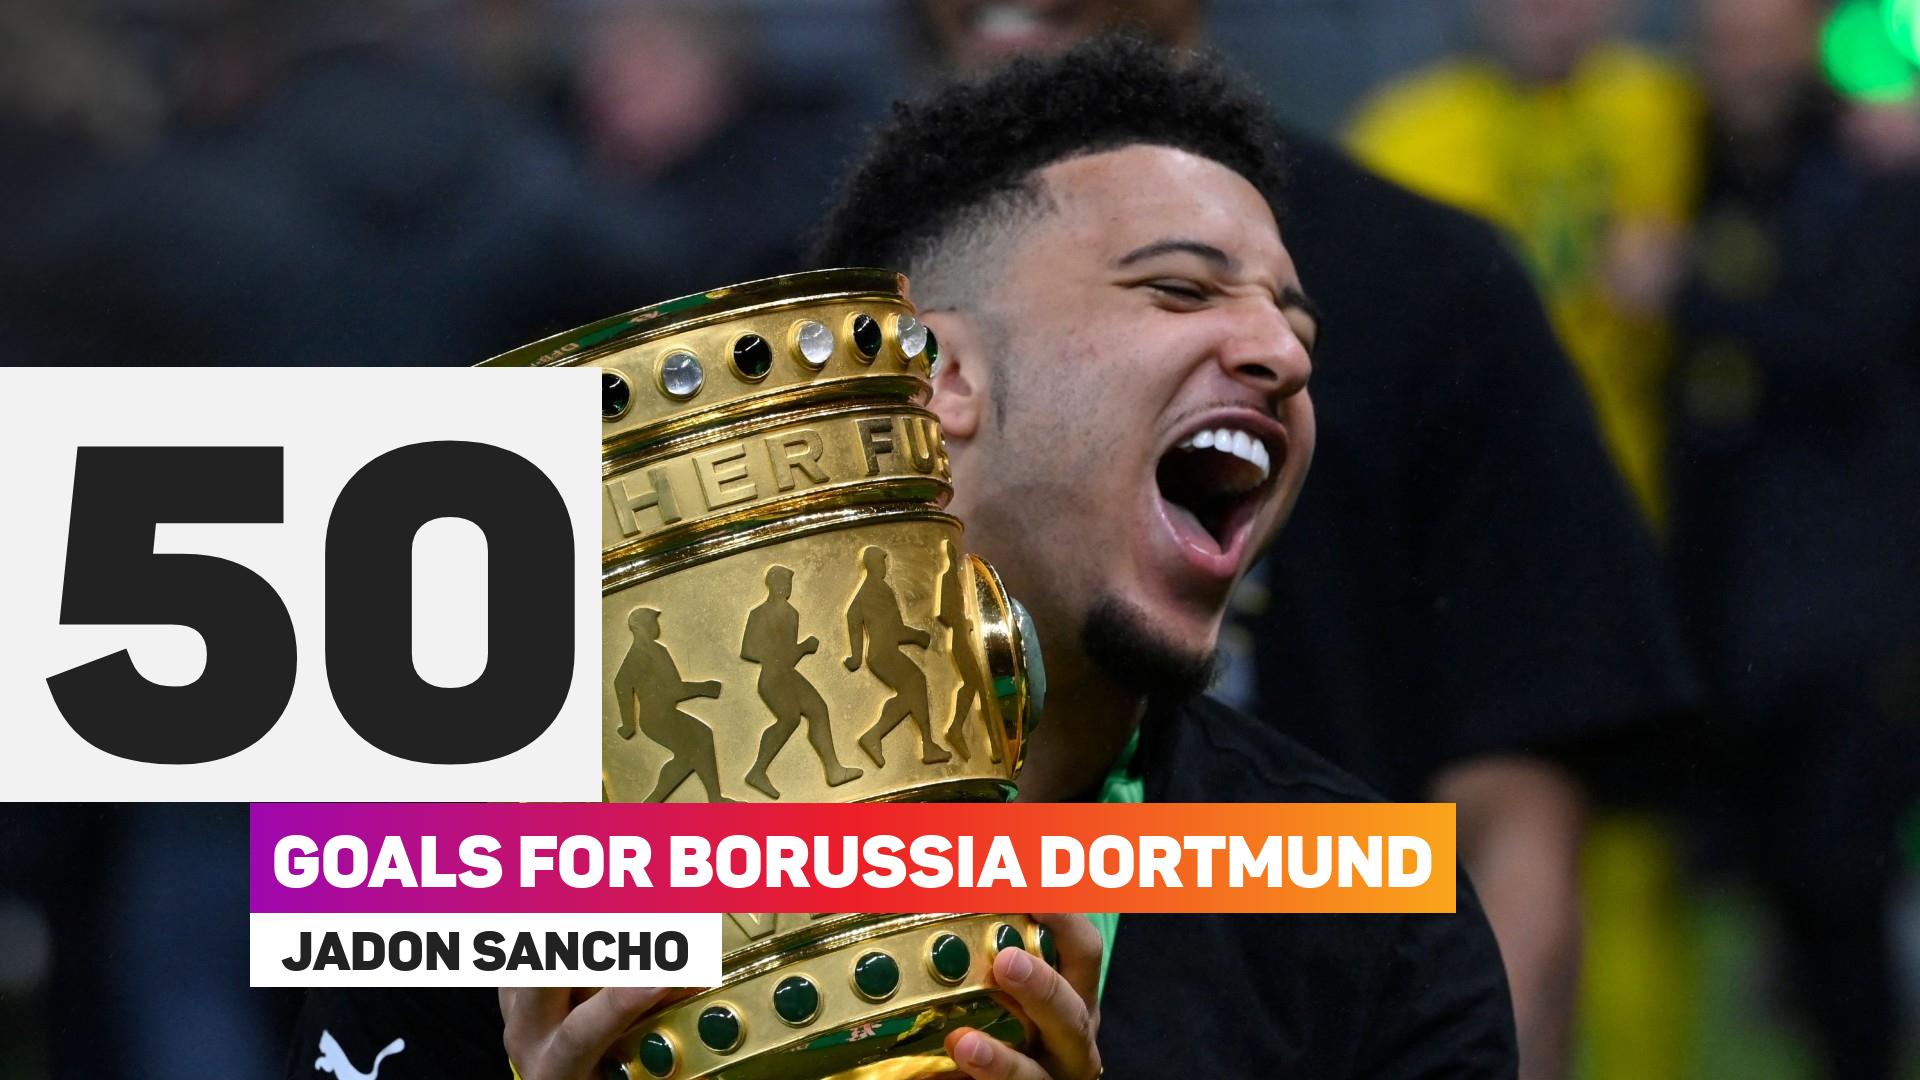 Jadon Sancho has netted 50 goals for Borussia Dortmund